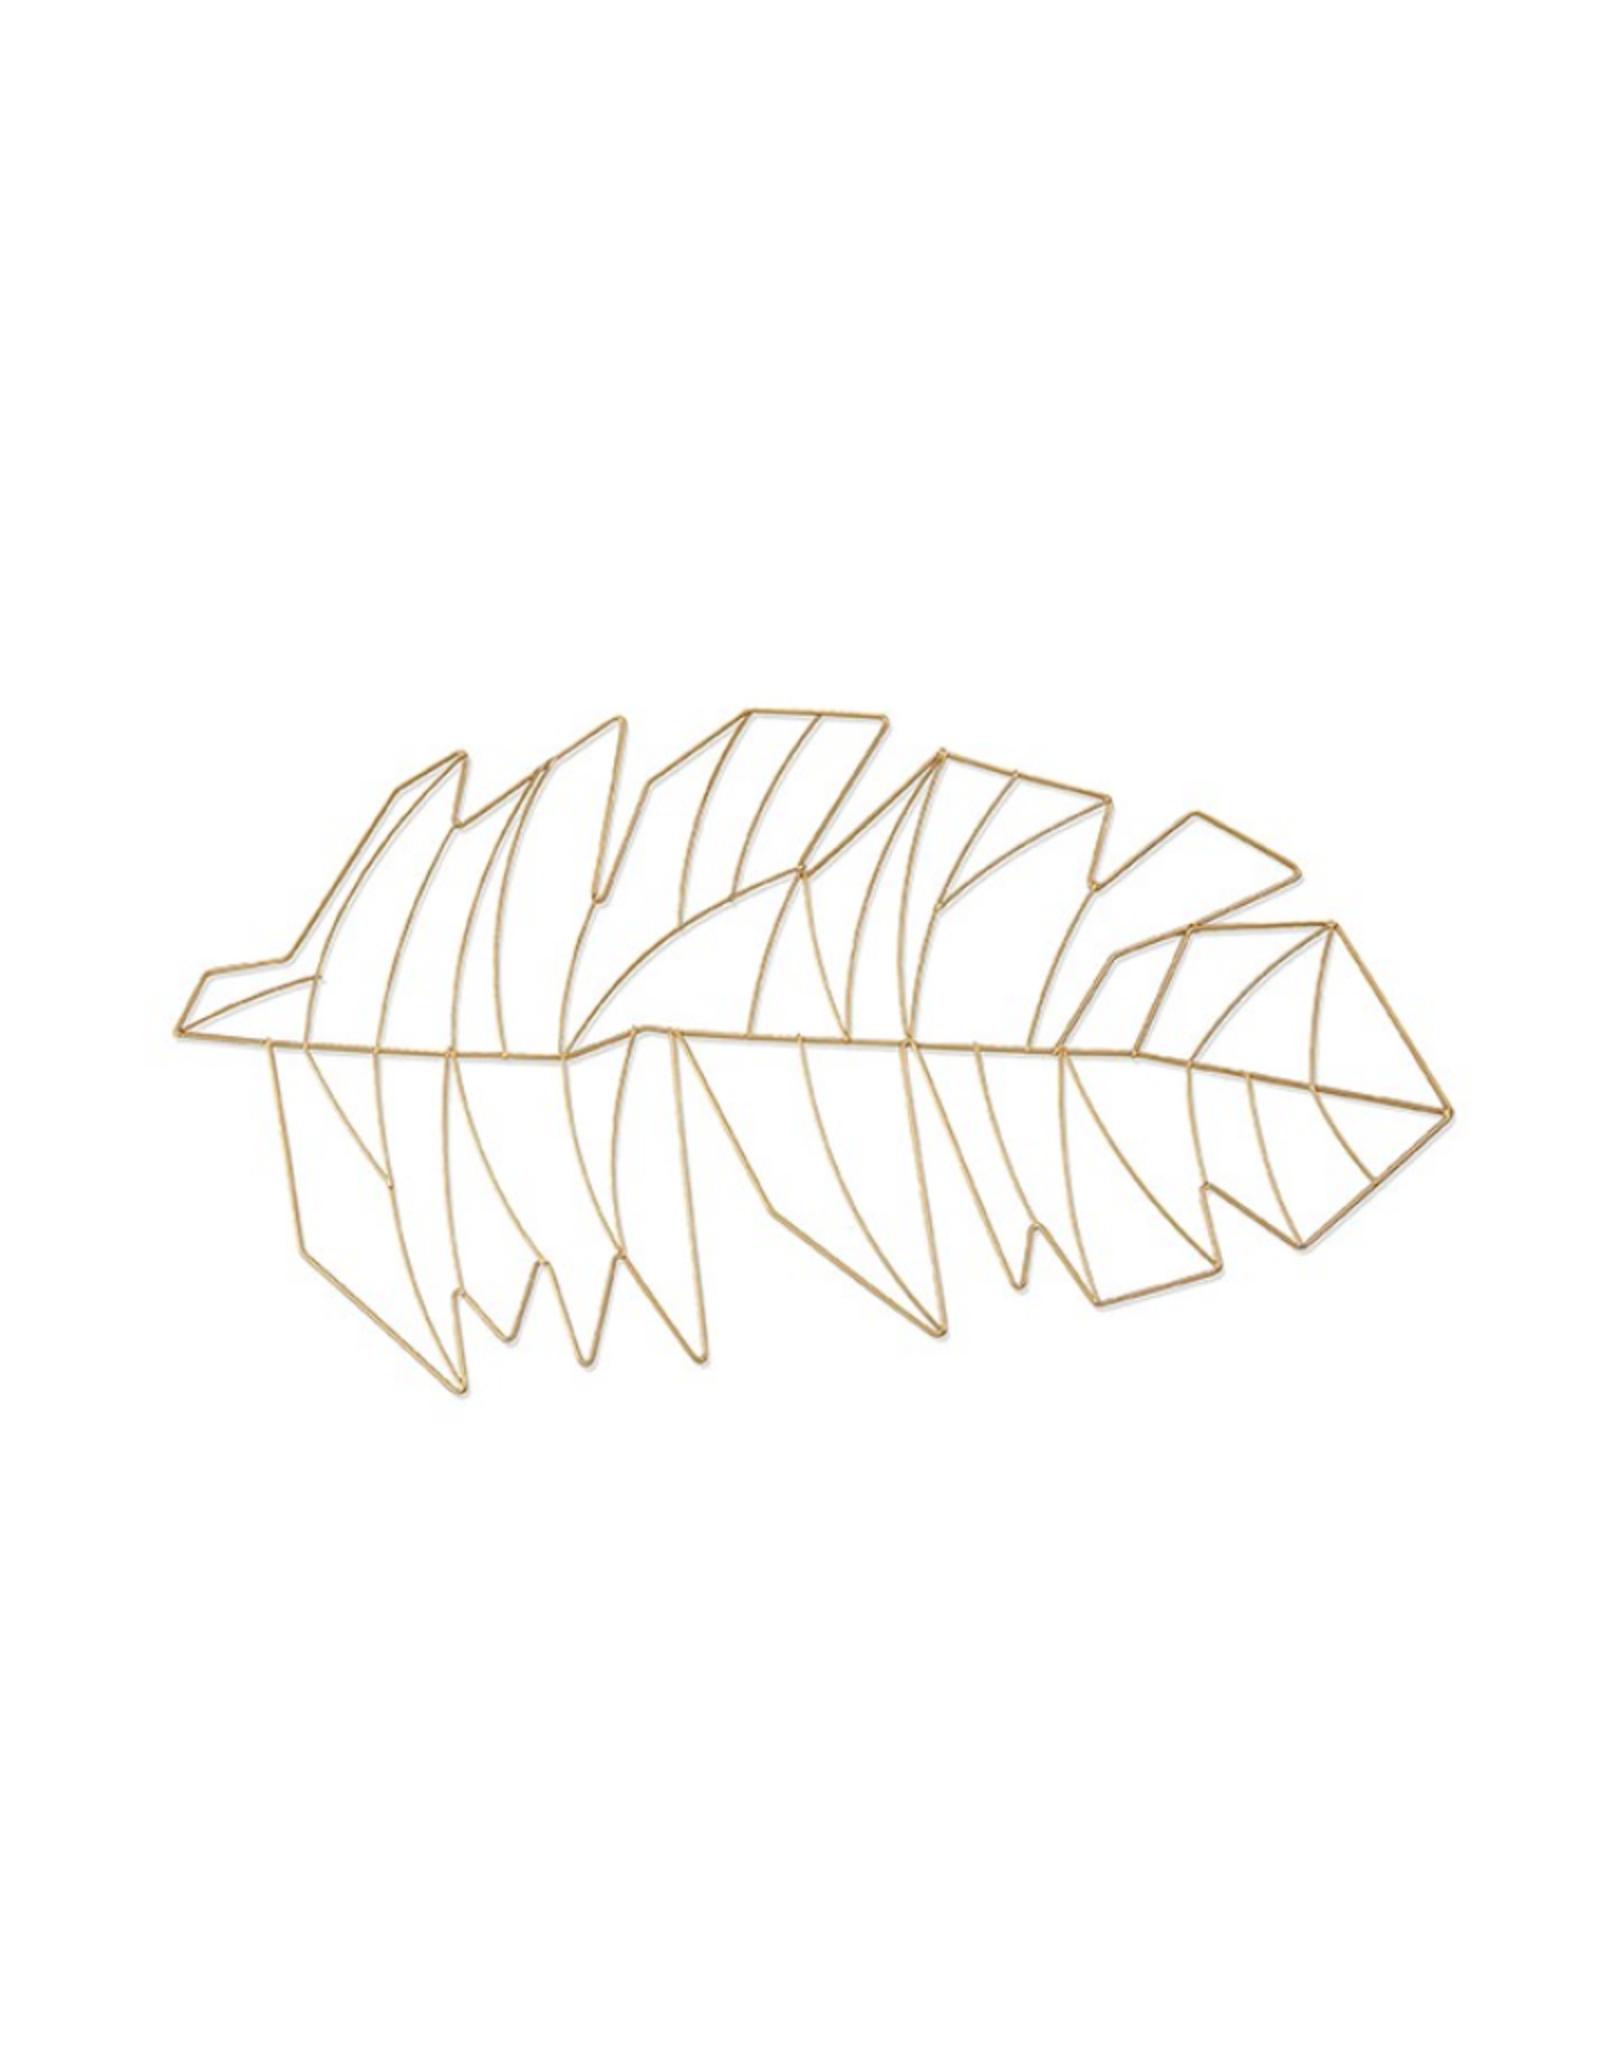 Harman Feuille de palmier en métal or 12 x 20